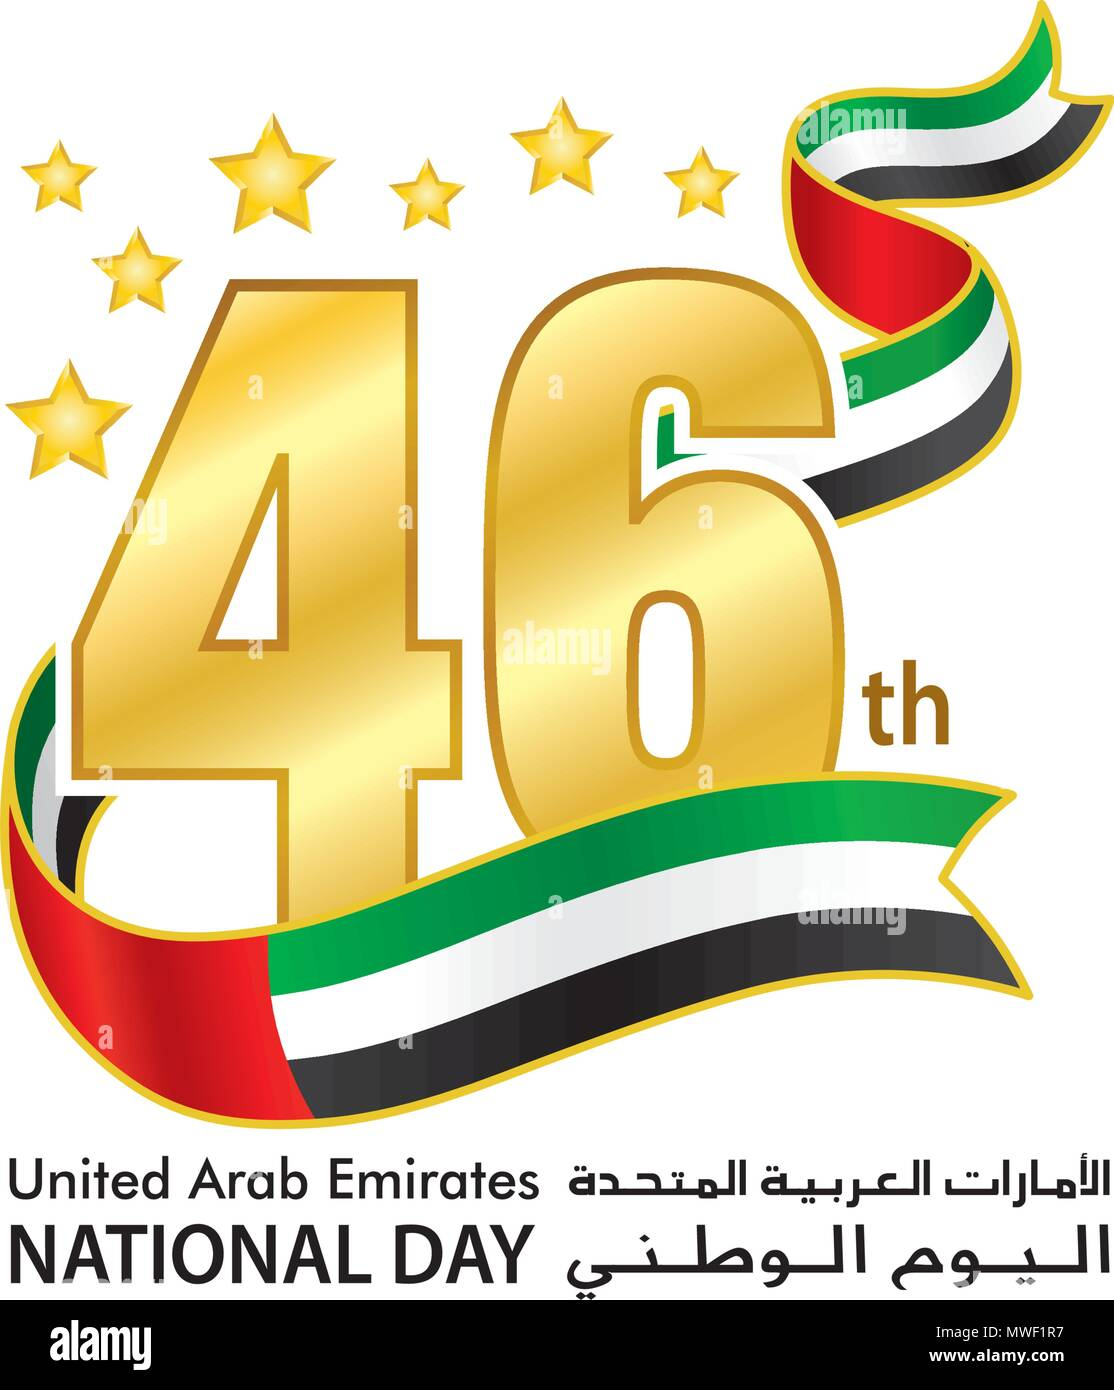 United Arab Emirates Stock Vector Images Alamy